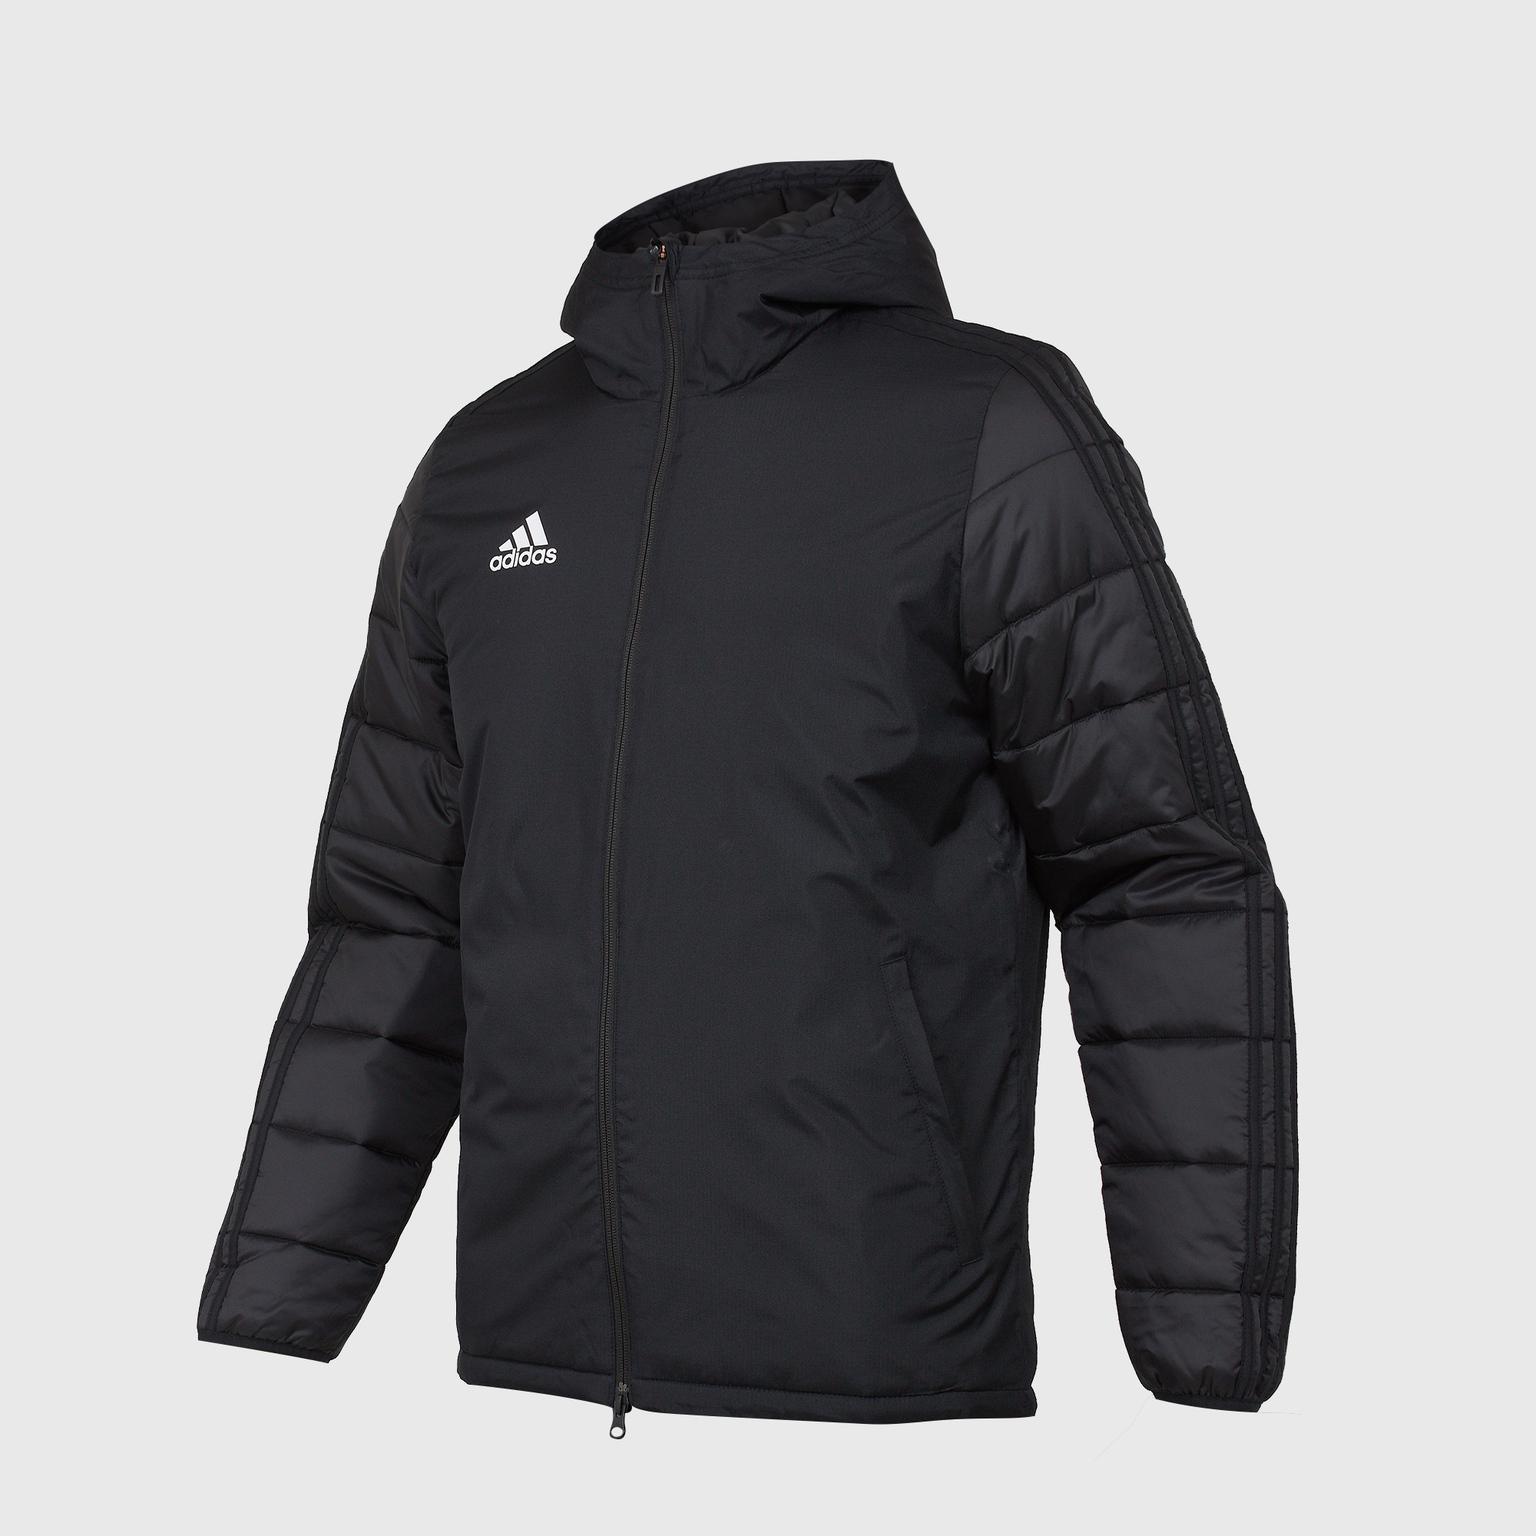 Куртка утепленная Adidas JKT18 Winter BQ6602 куртки пуховики adidas куртка утепленная adidas jkt18 std parka bq6594